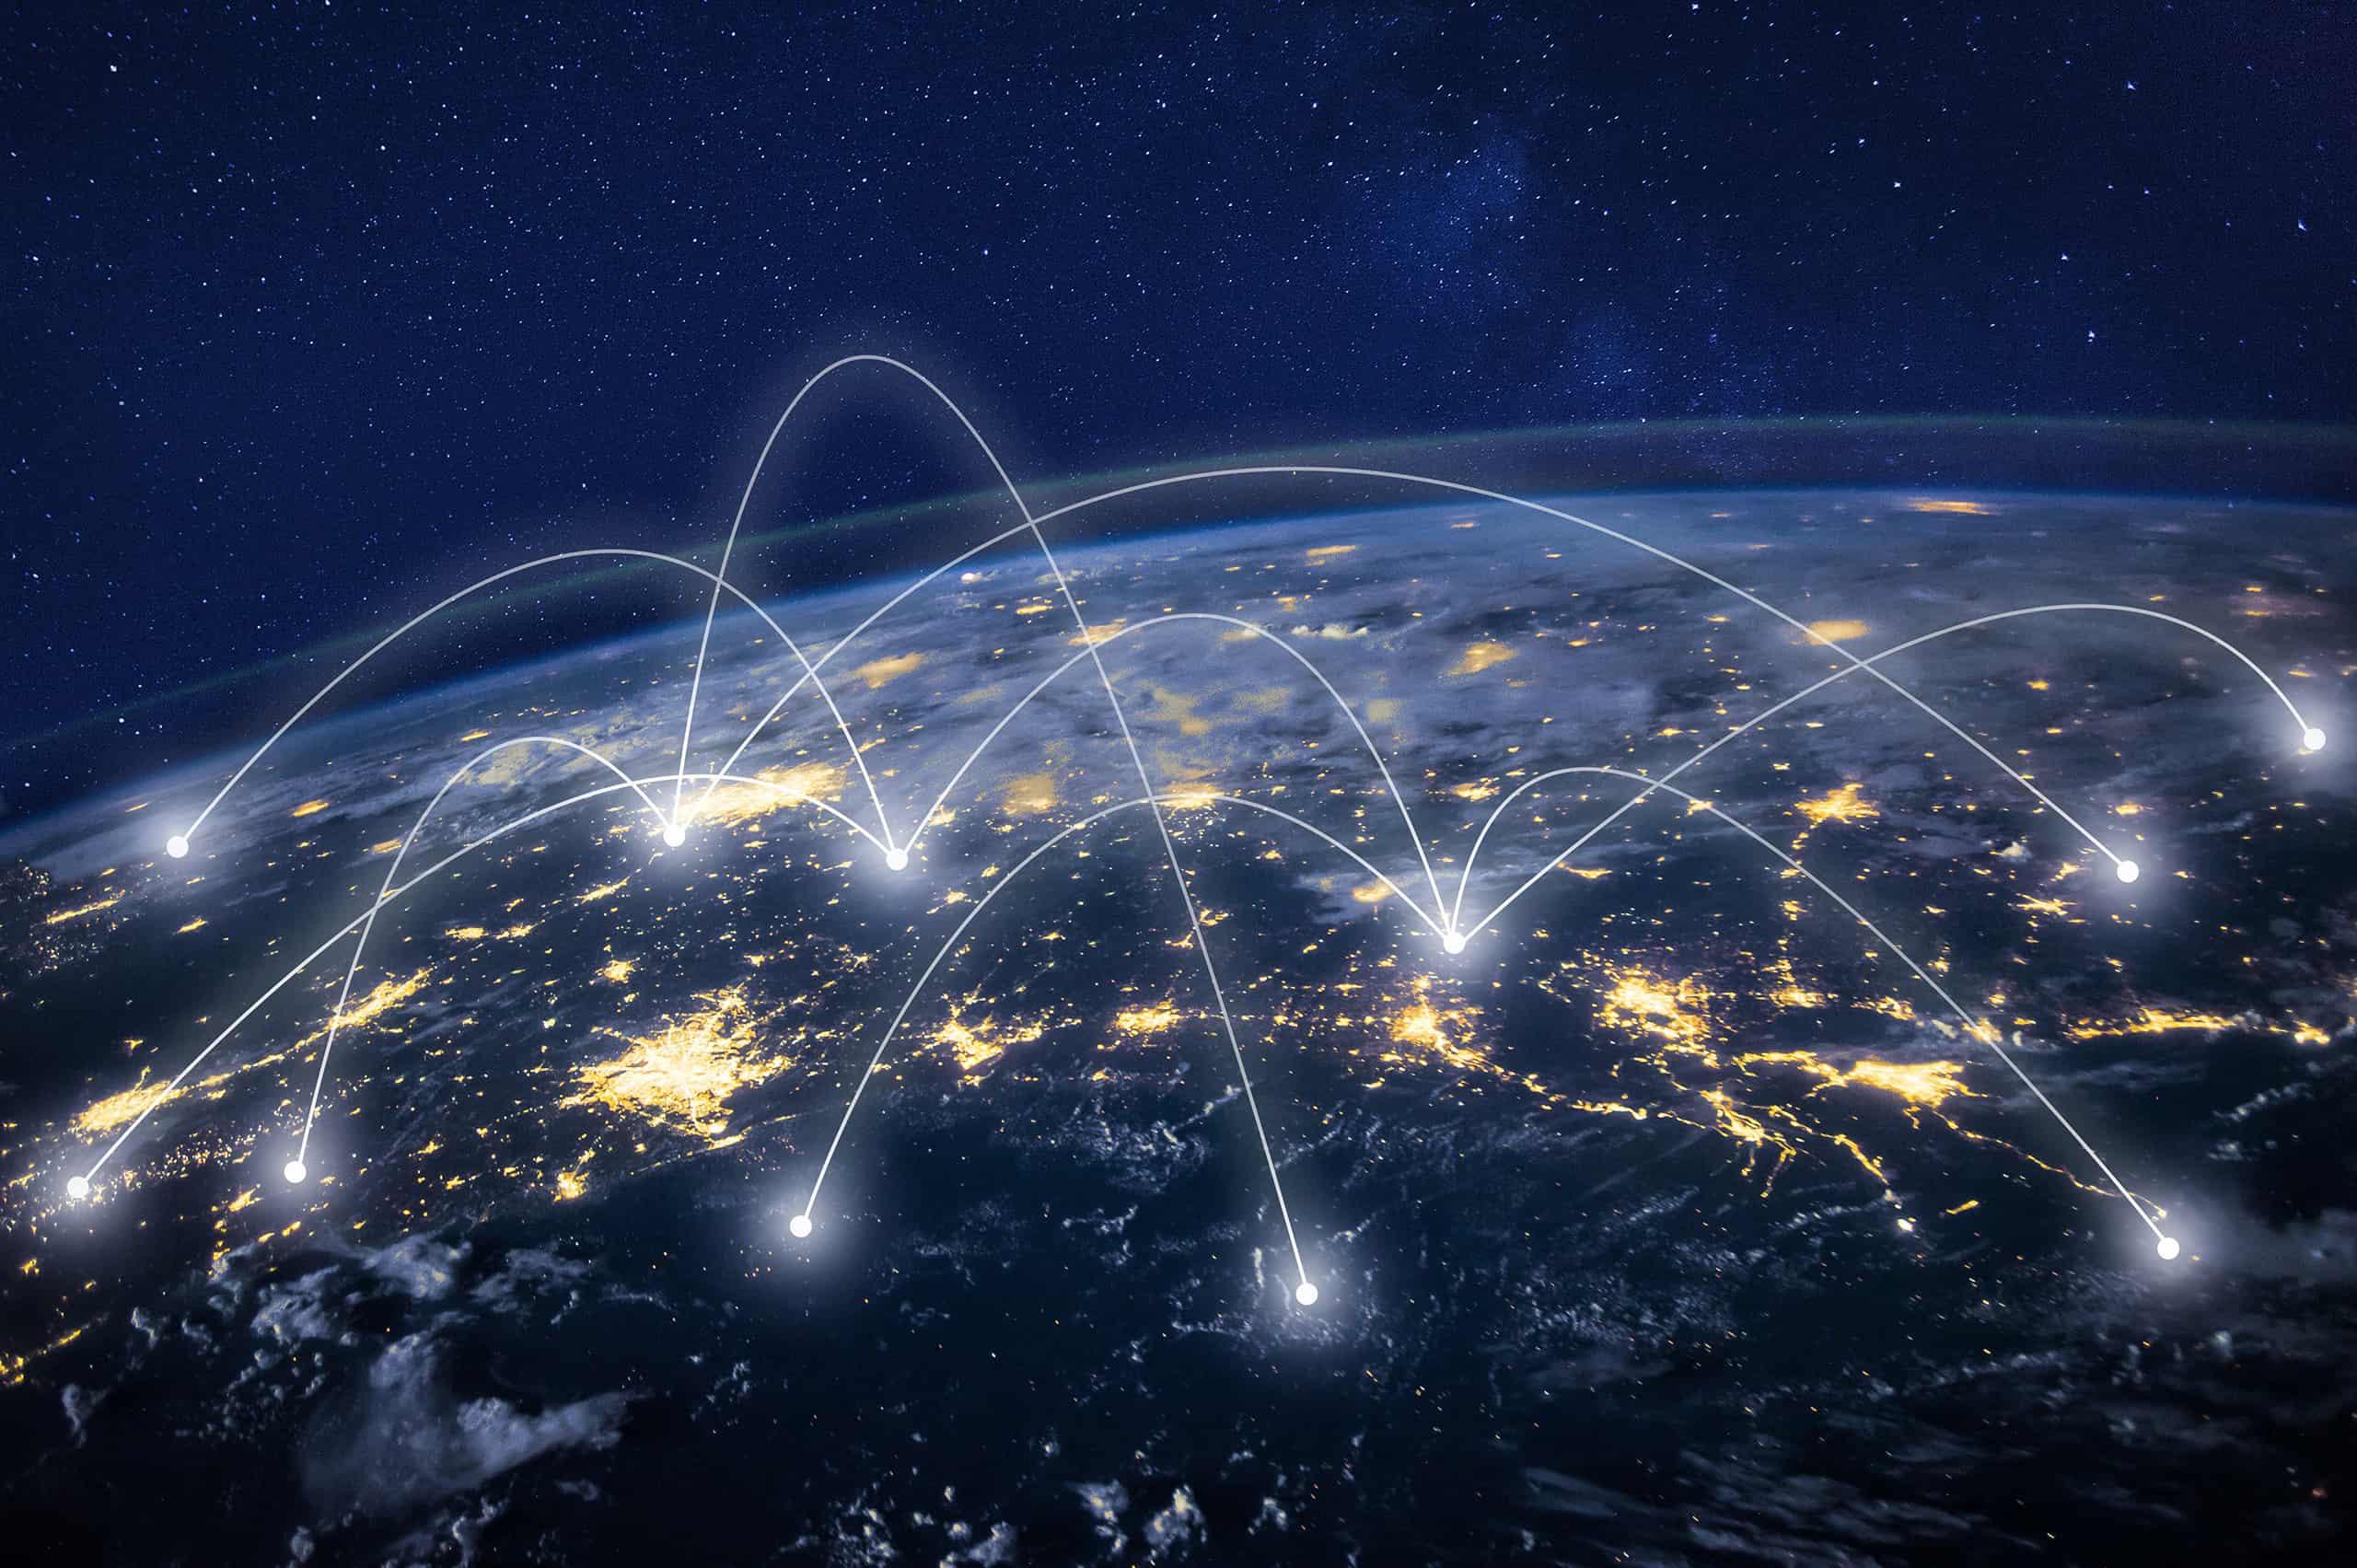 Global network concept artwork